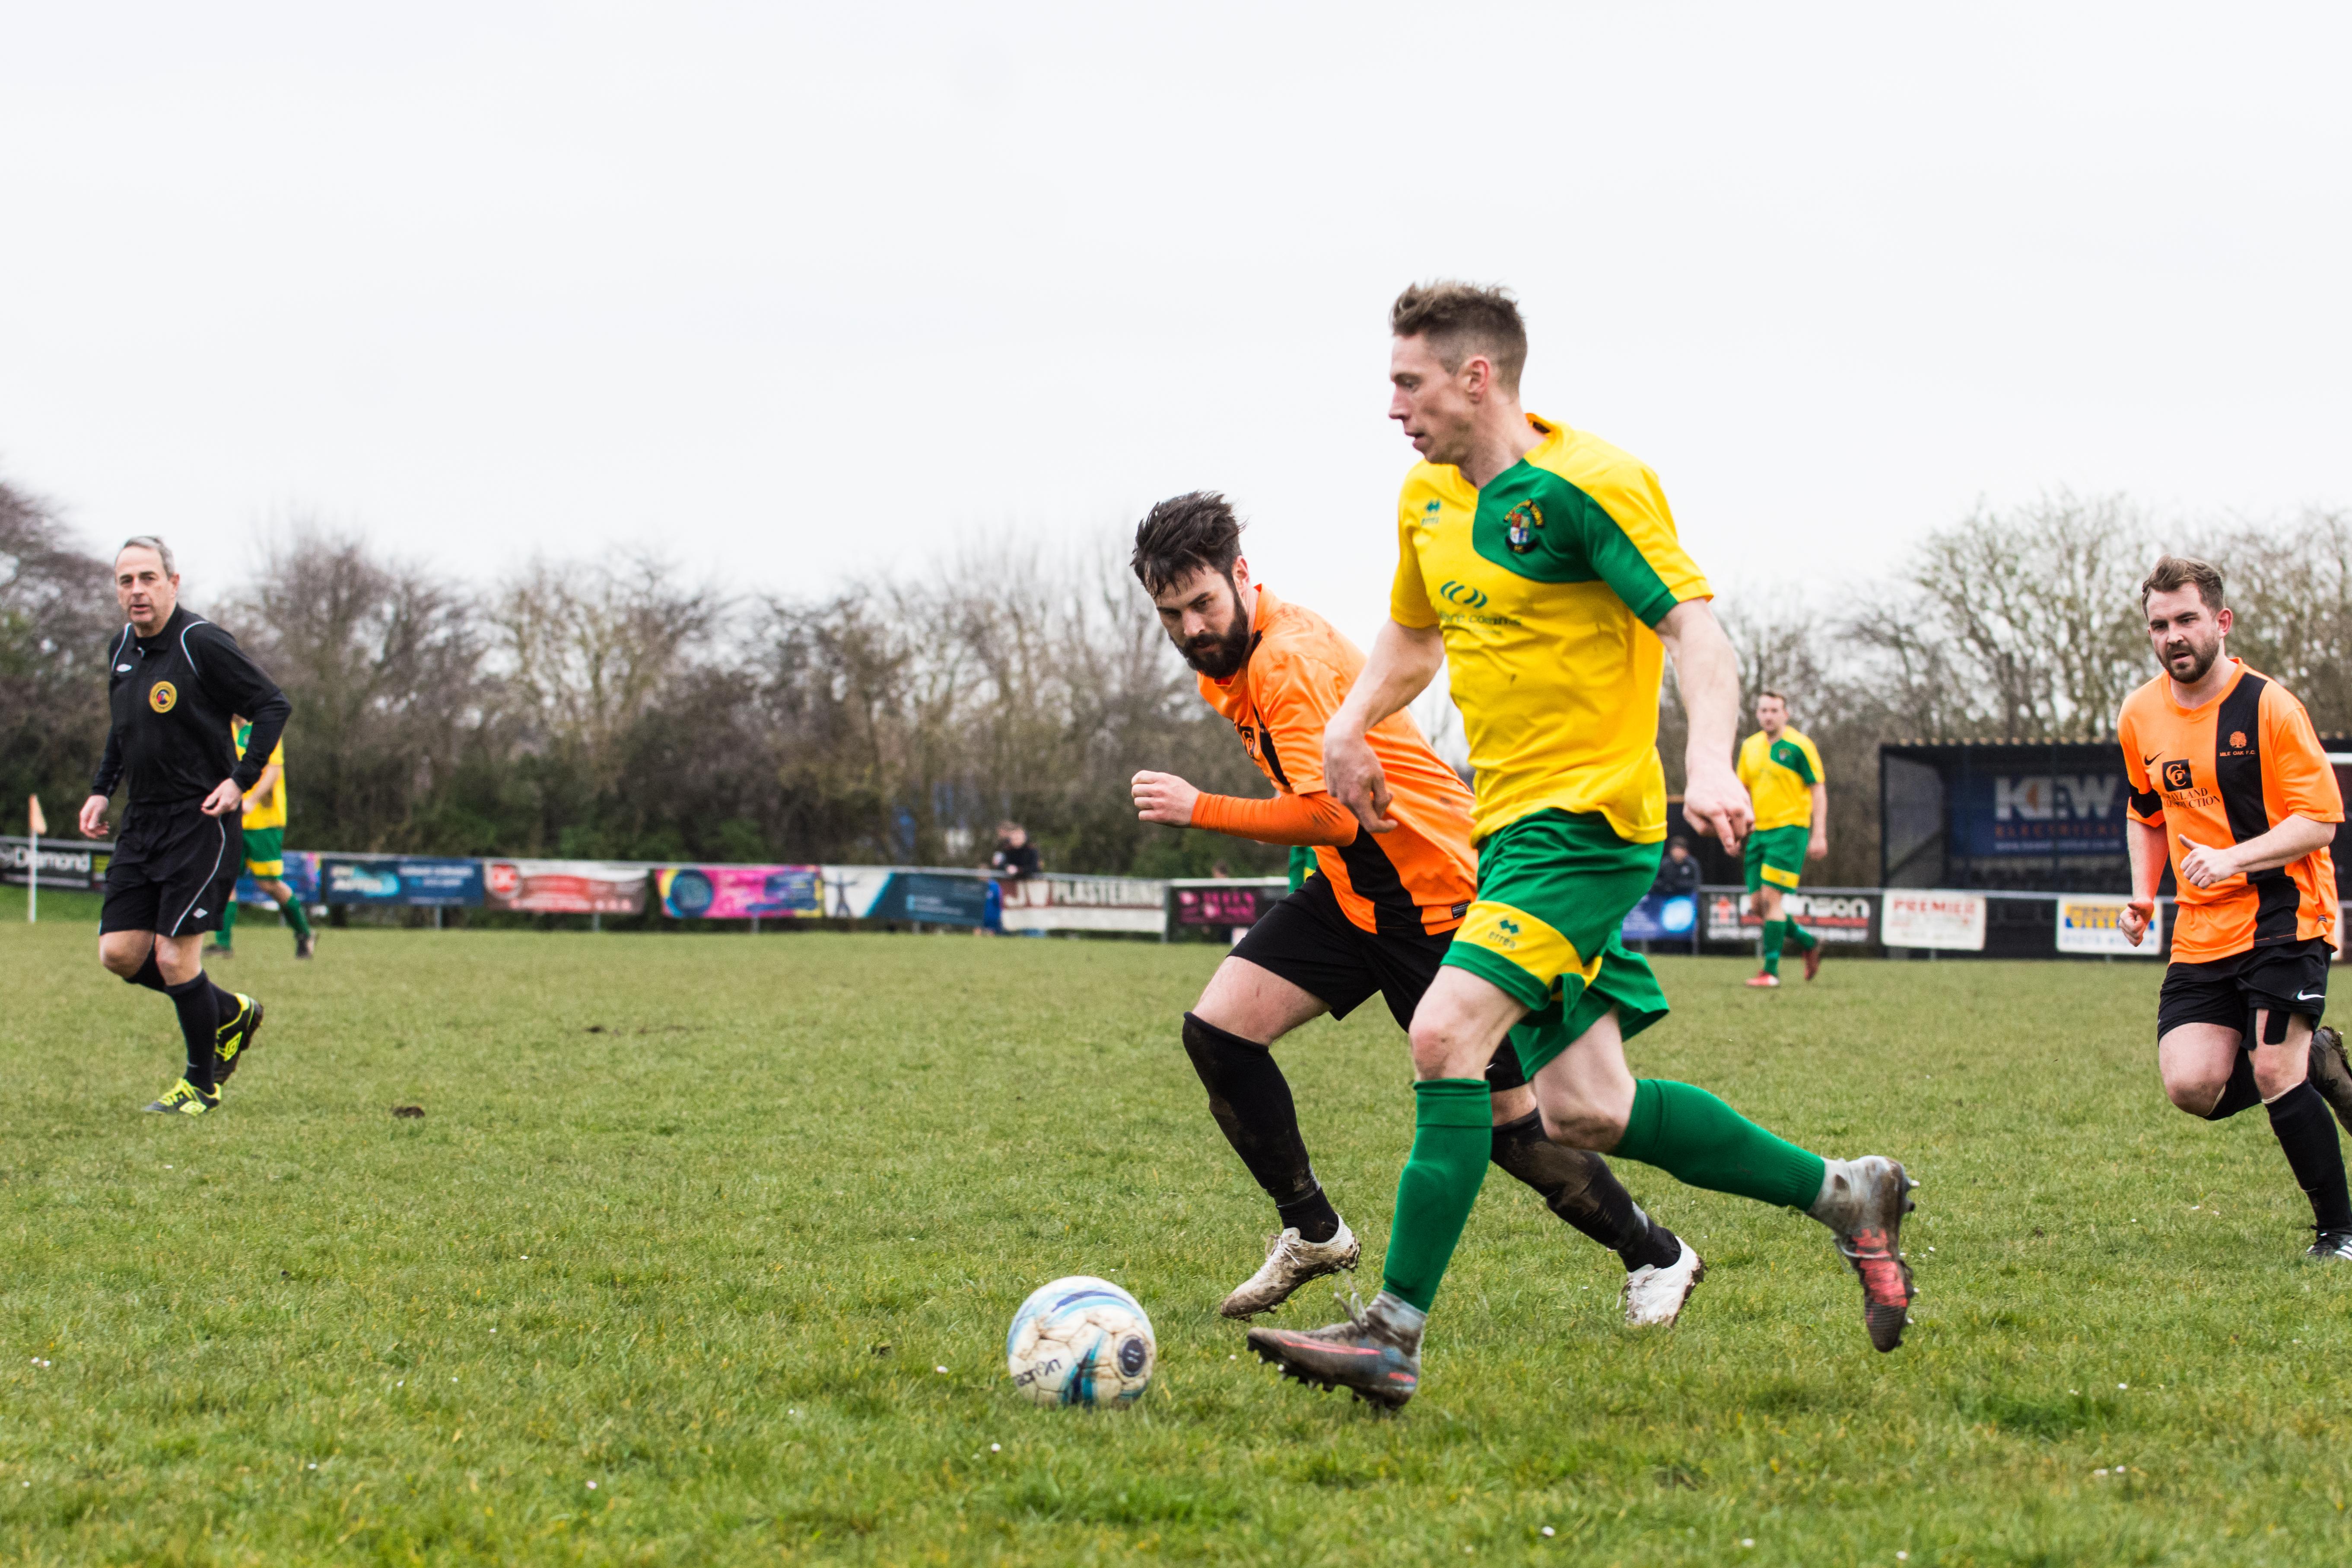 DAVID_JEFFERY Mile Oak FC vs Hailsham Town FC 24.03.18 70